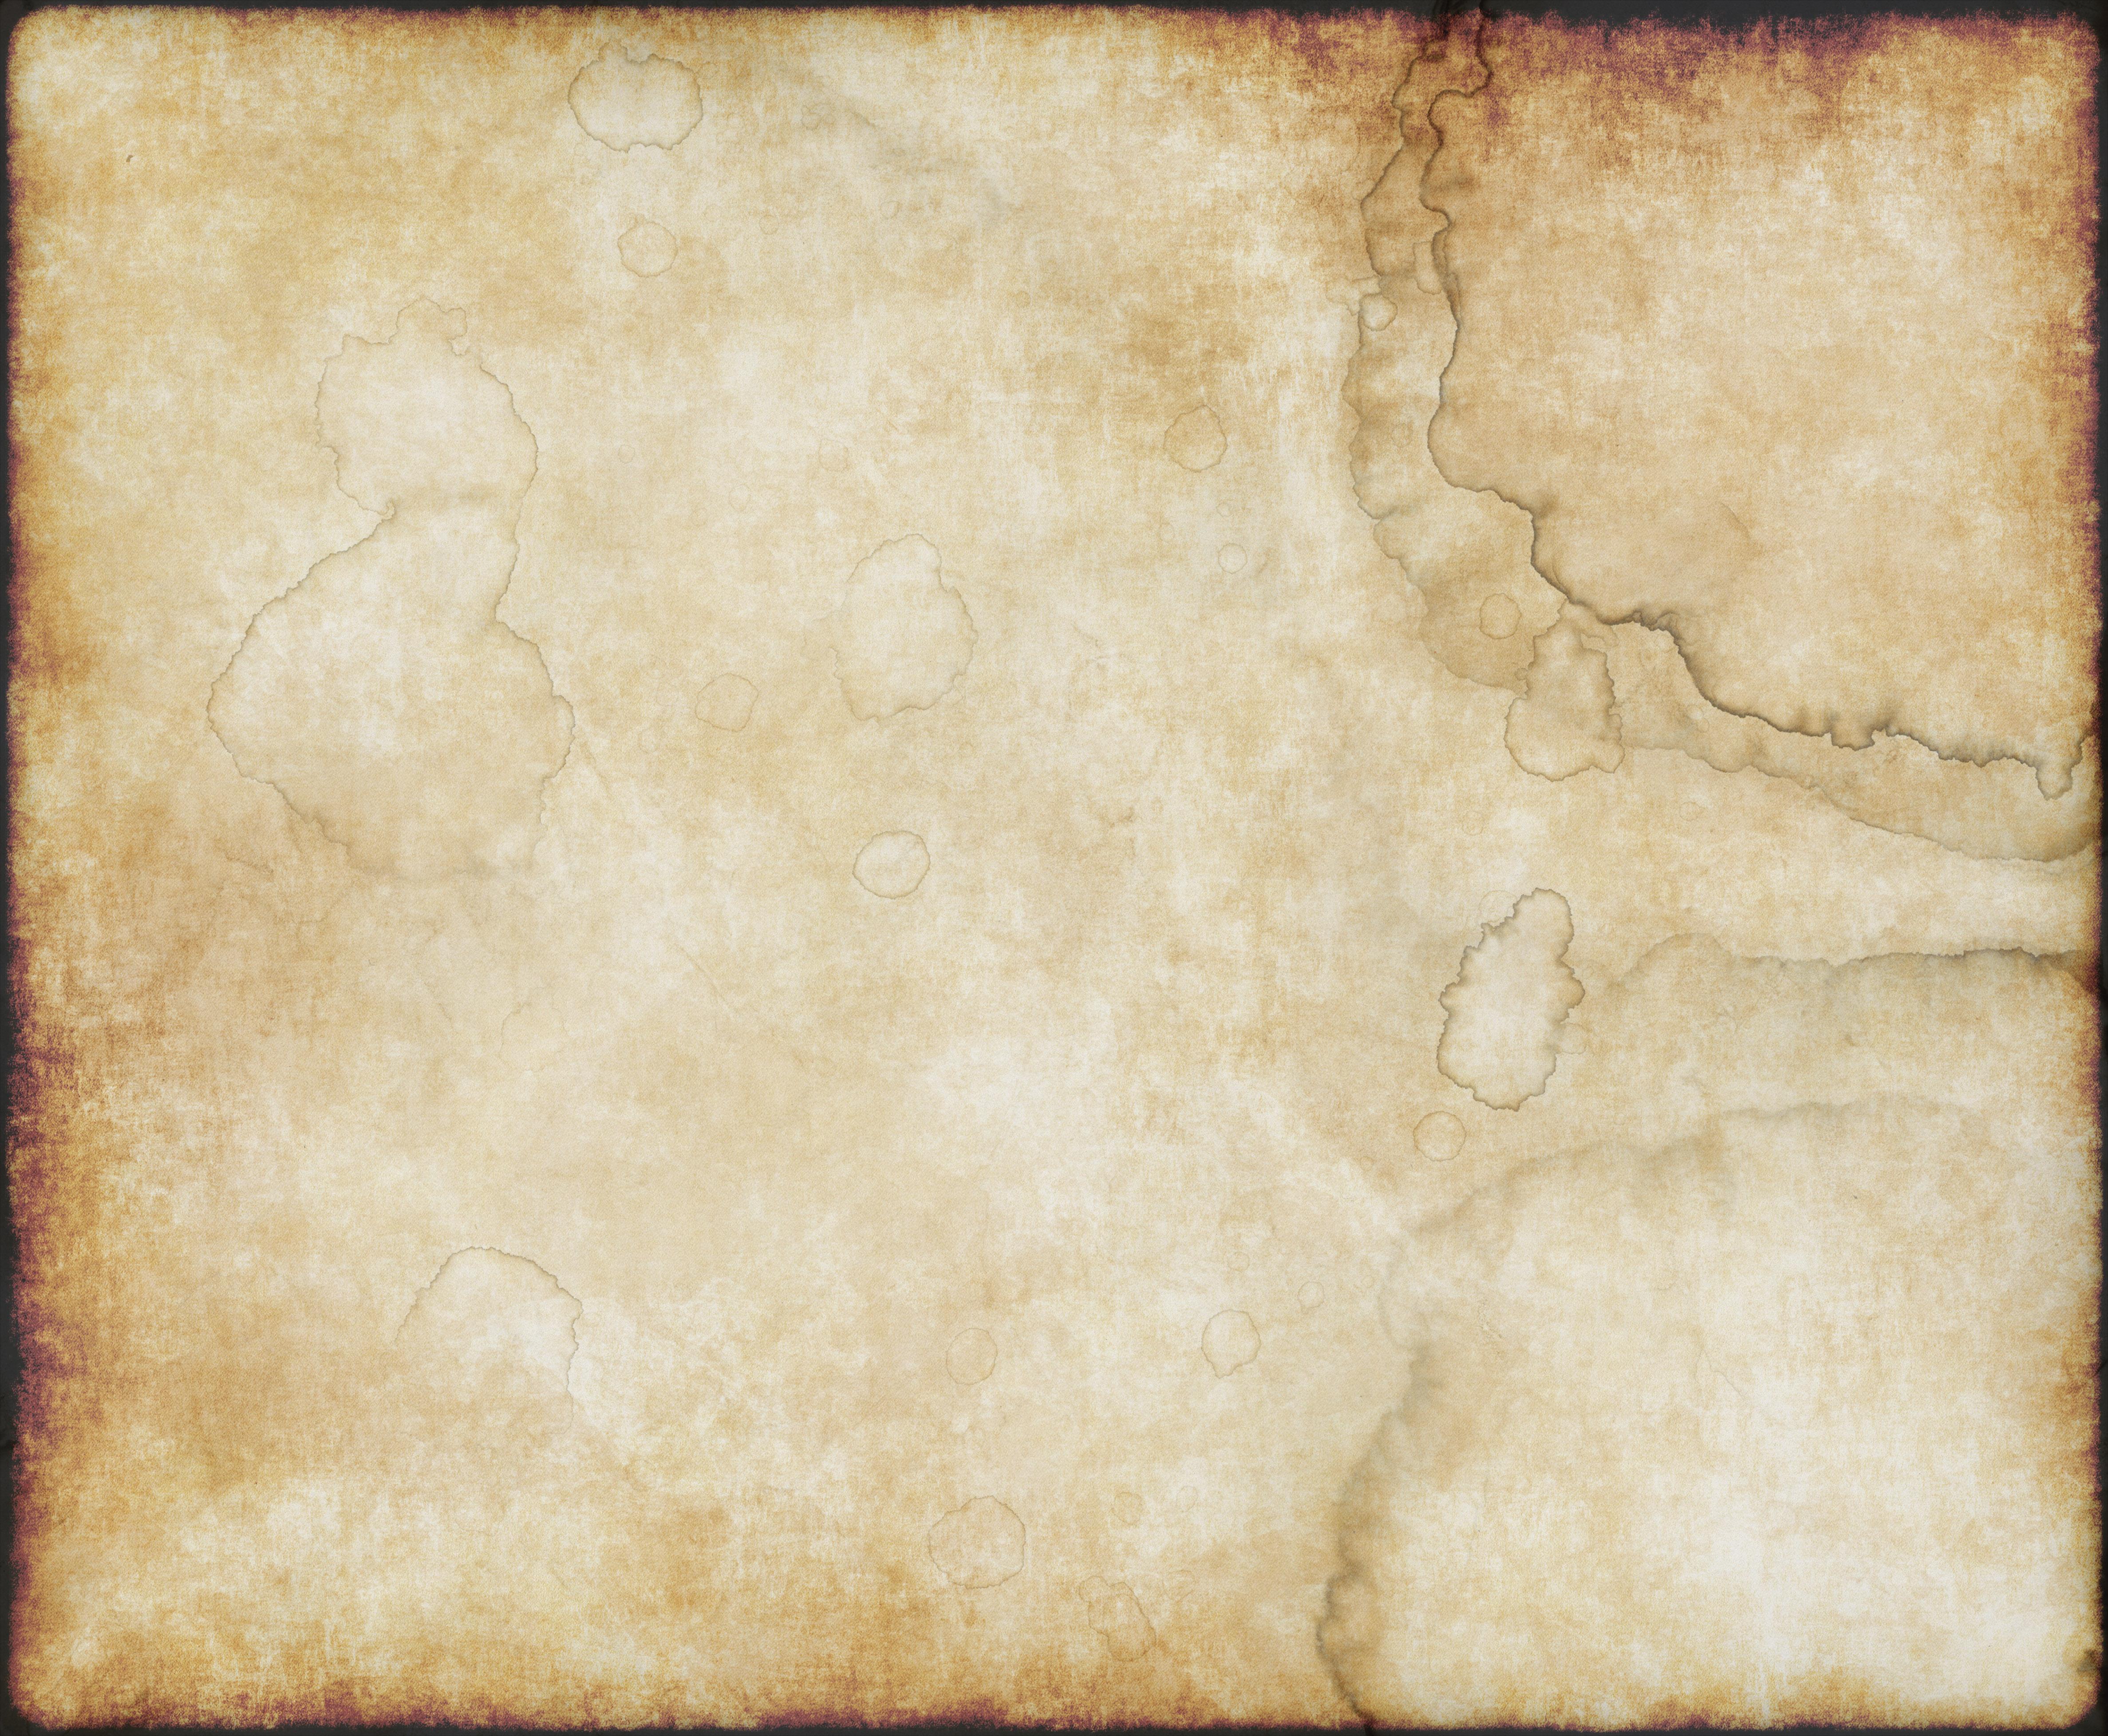 Excellent old brown paper texture background wwwmyfreetexturescom 4750x3912